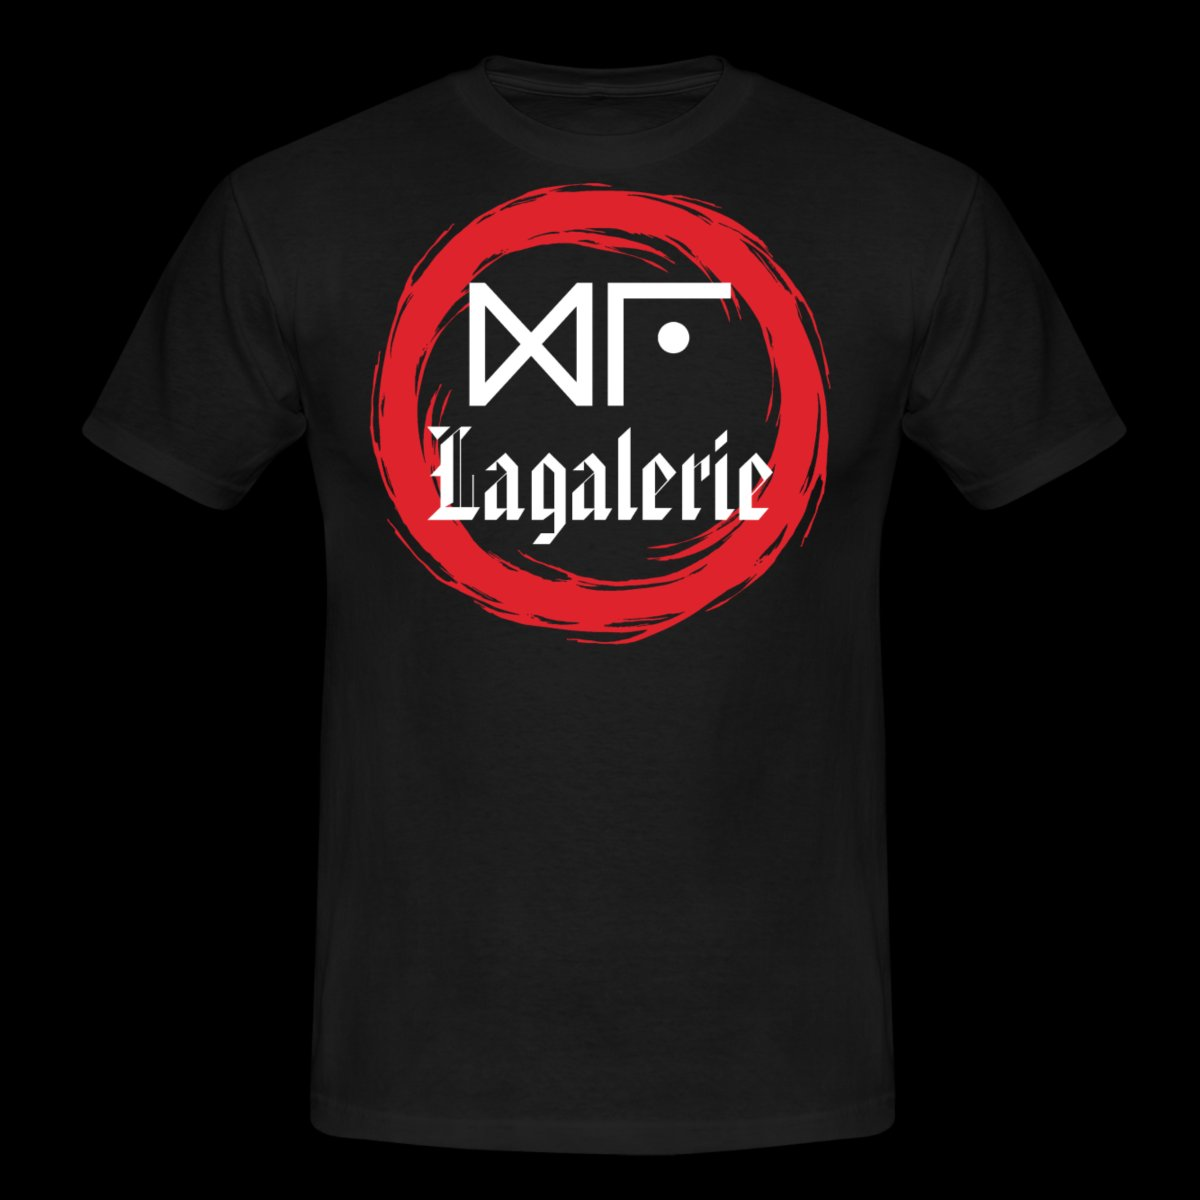 logo Gu Lagalerie